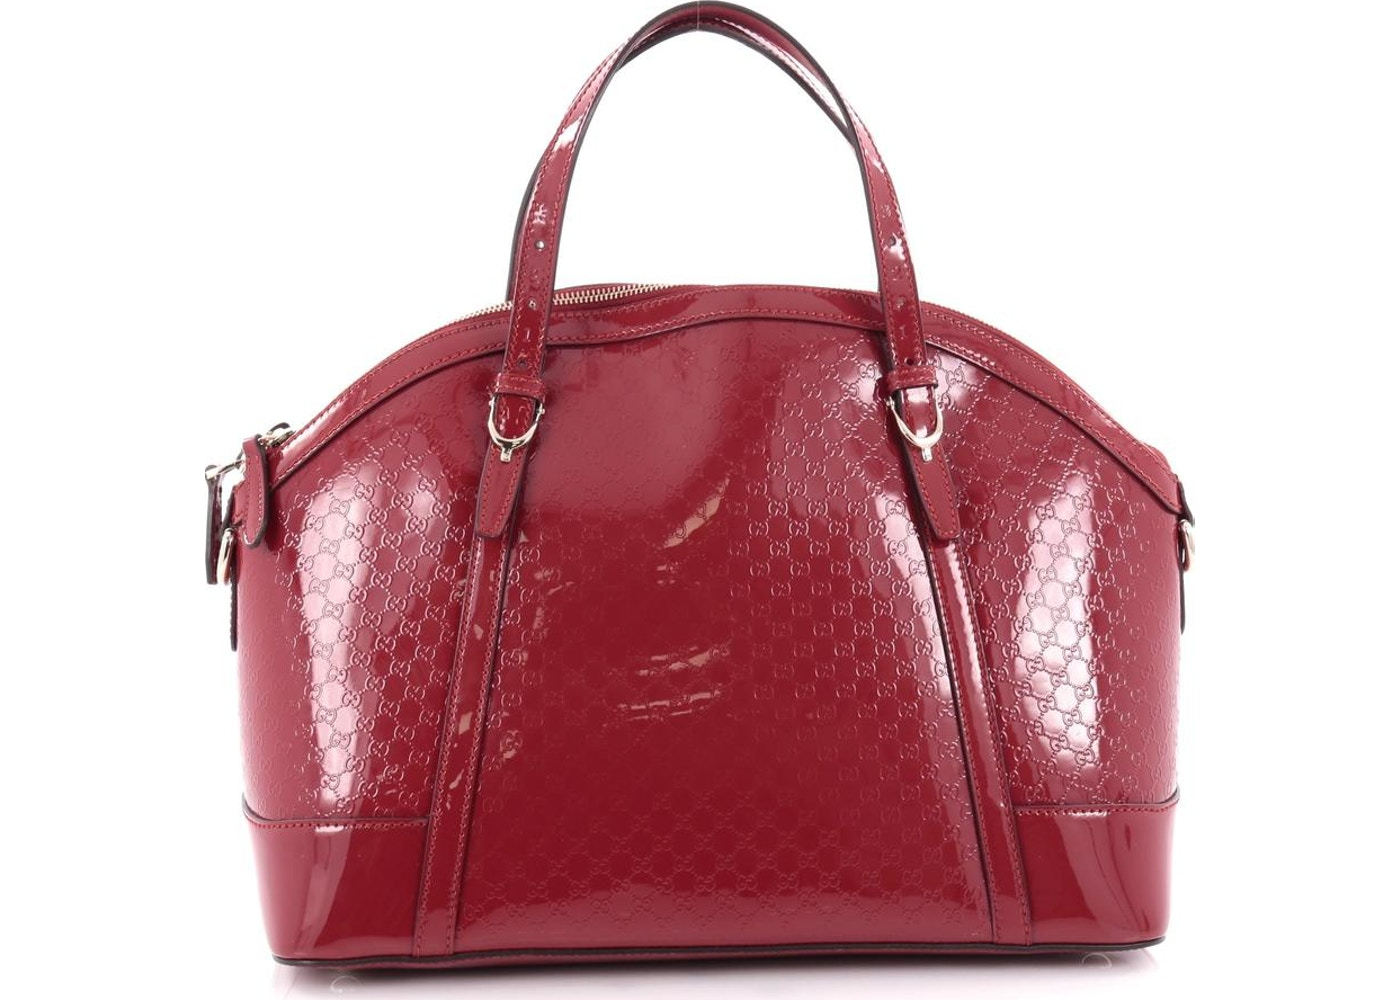 f7740e9083c2 Gucci Nice Top Handle Microguccissima Top Handle Medium Glossy ...